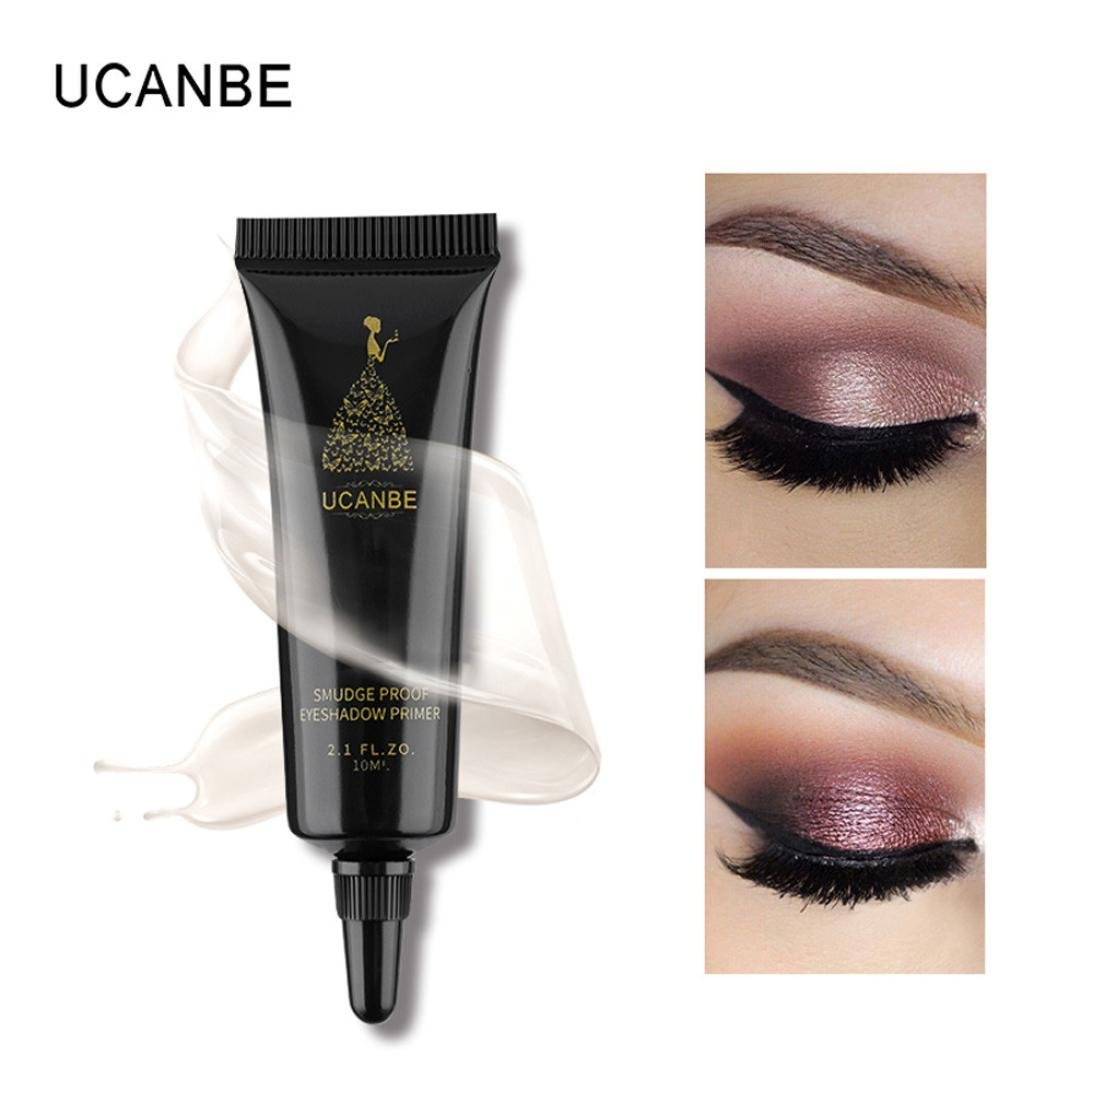 Hometom BB Cream, Eye Primer by Radiant Complex Eyeshadow Base For a Perfectly Primed eyelid